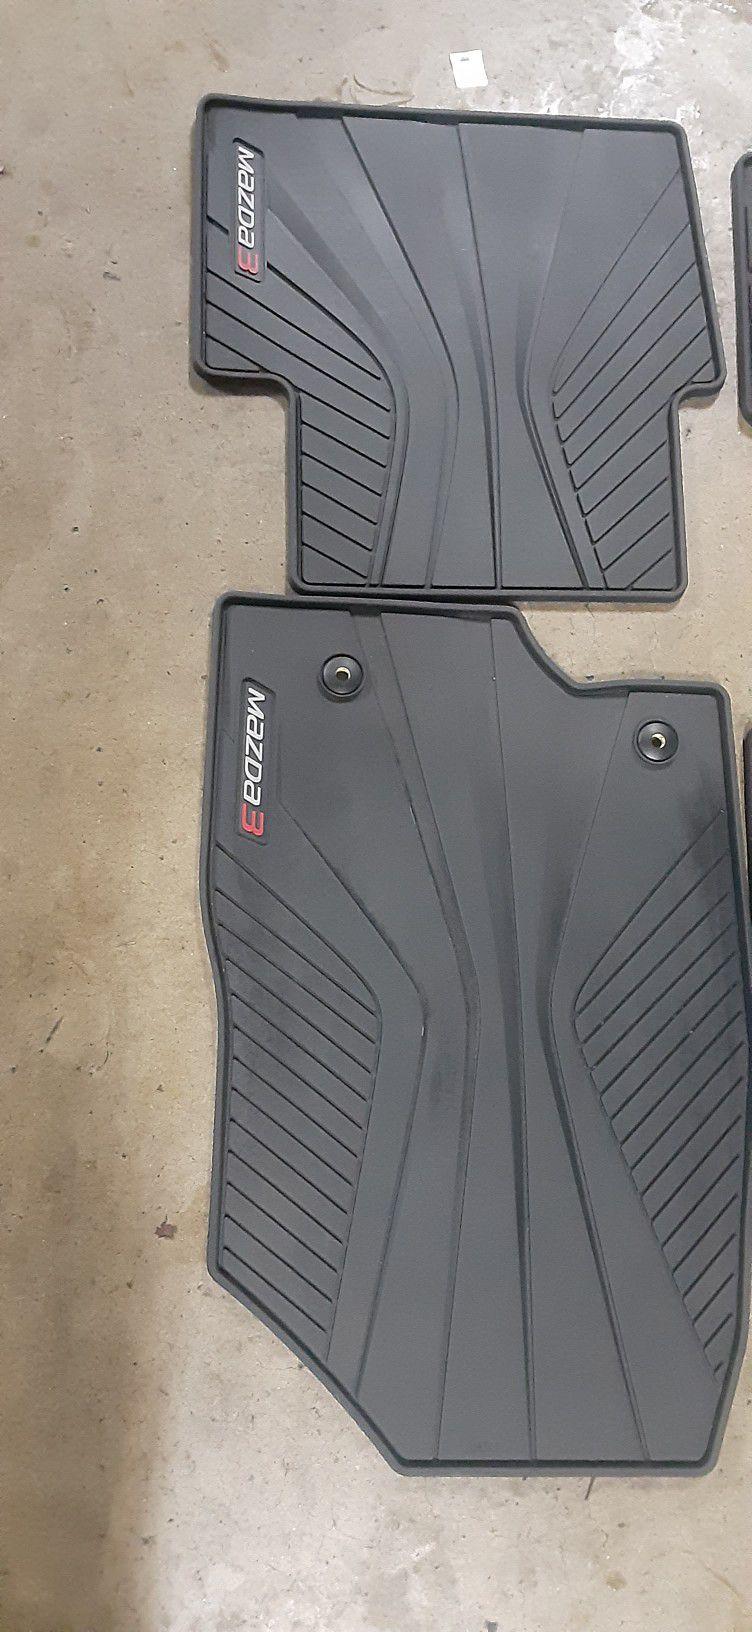 Mazda 3 Genuine Floor Matts OEM Black All Weather Rubber. 2014 - 2018